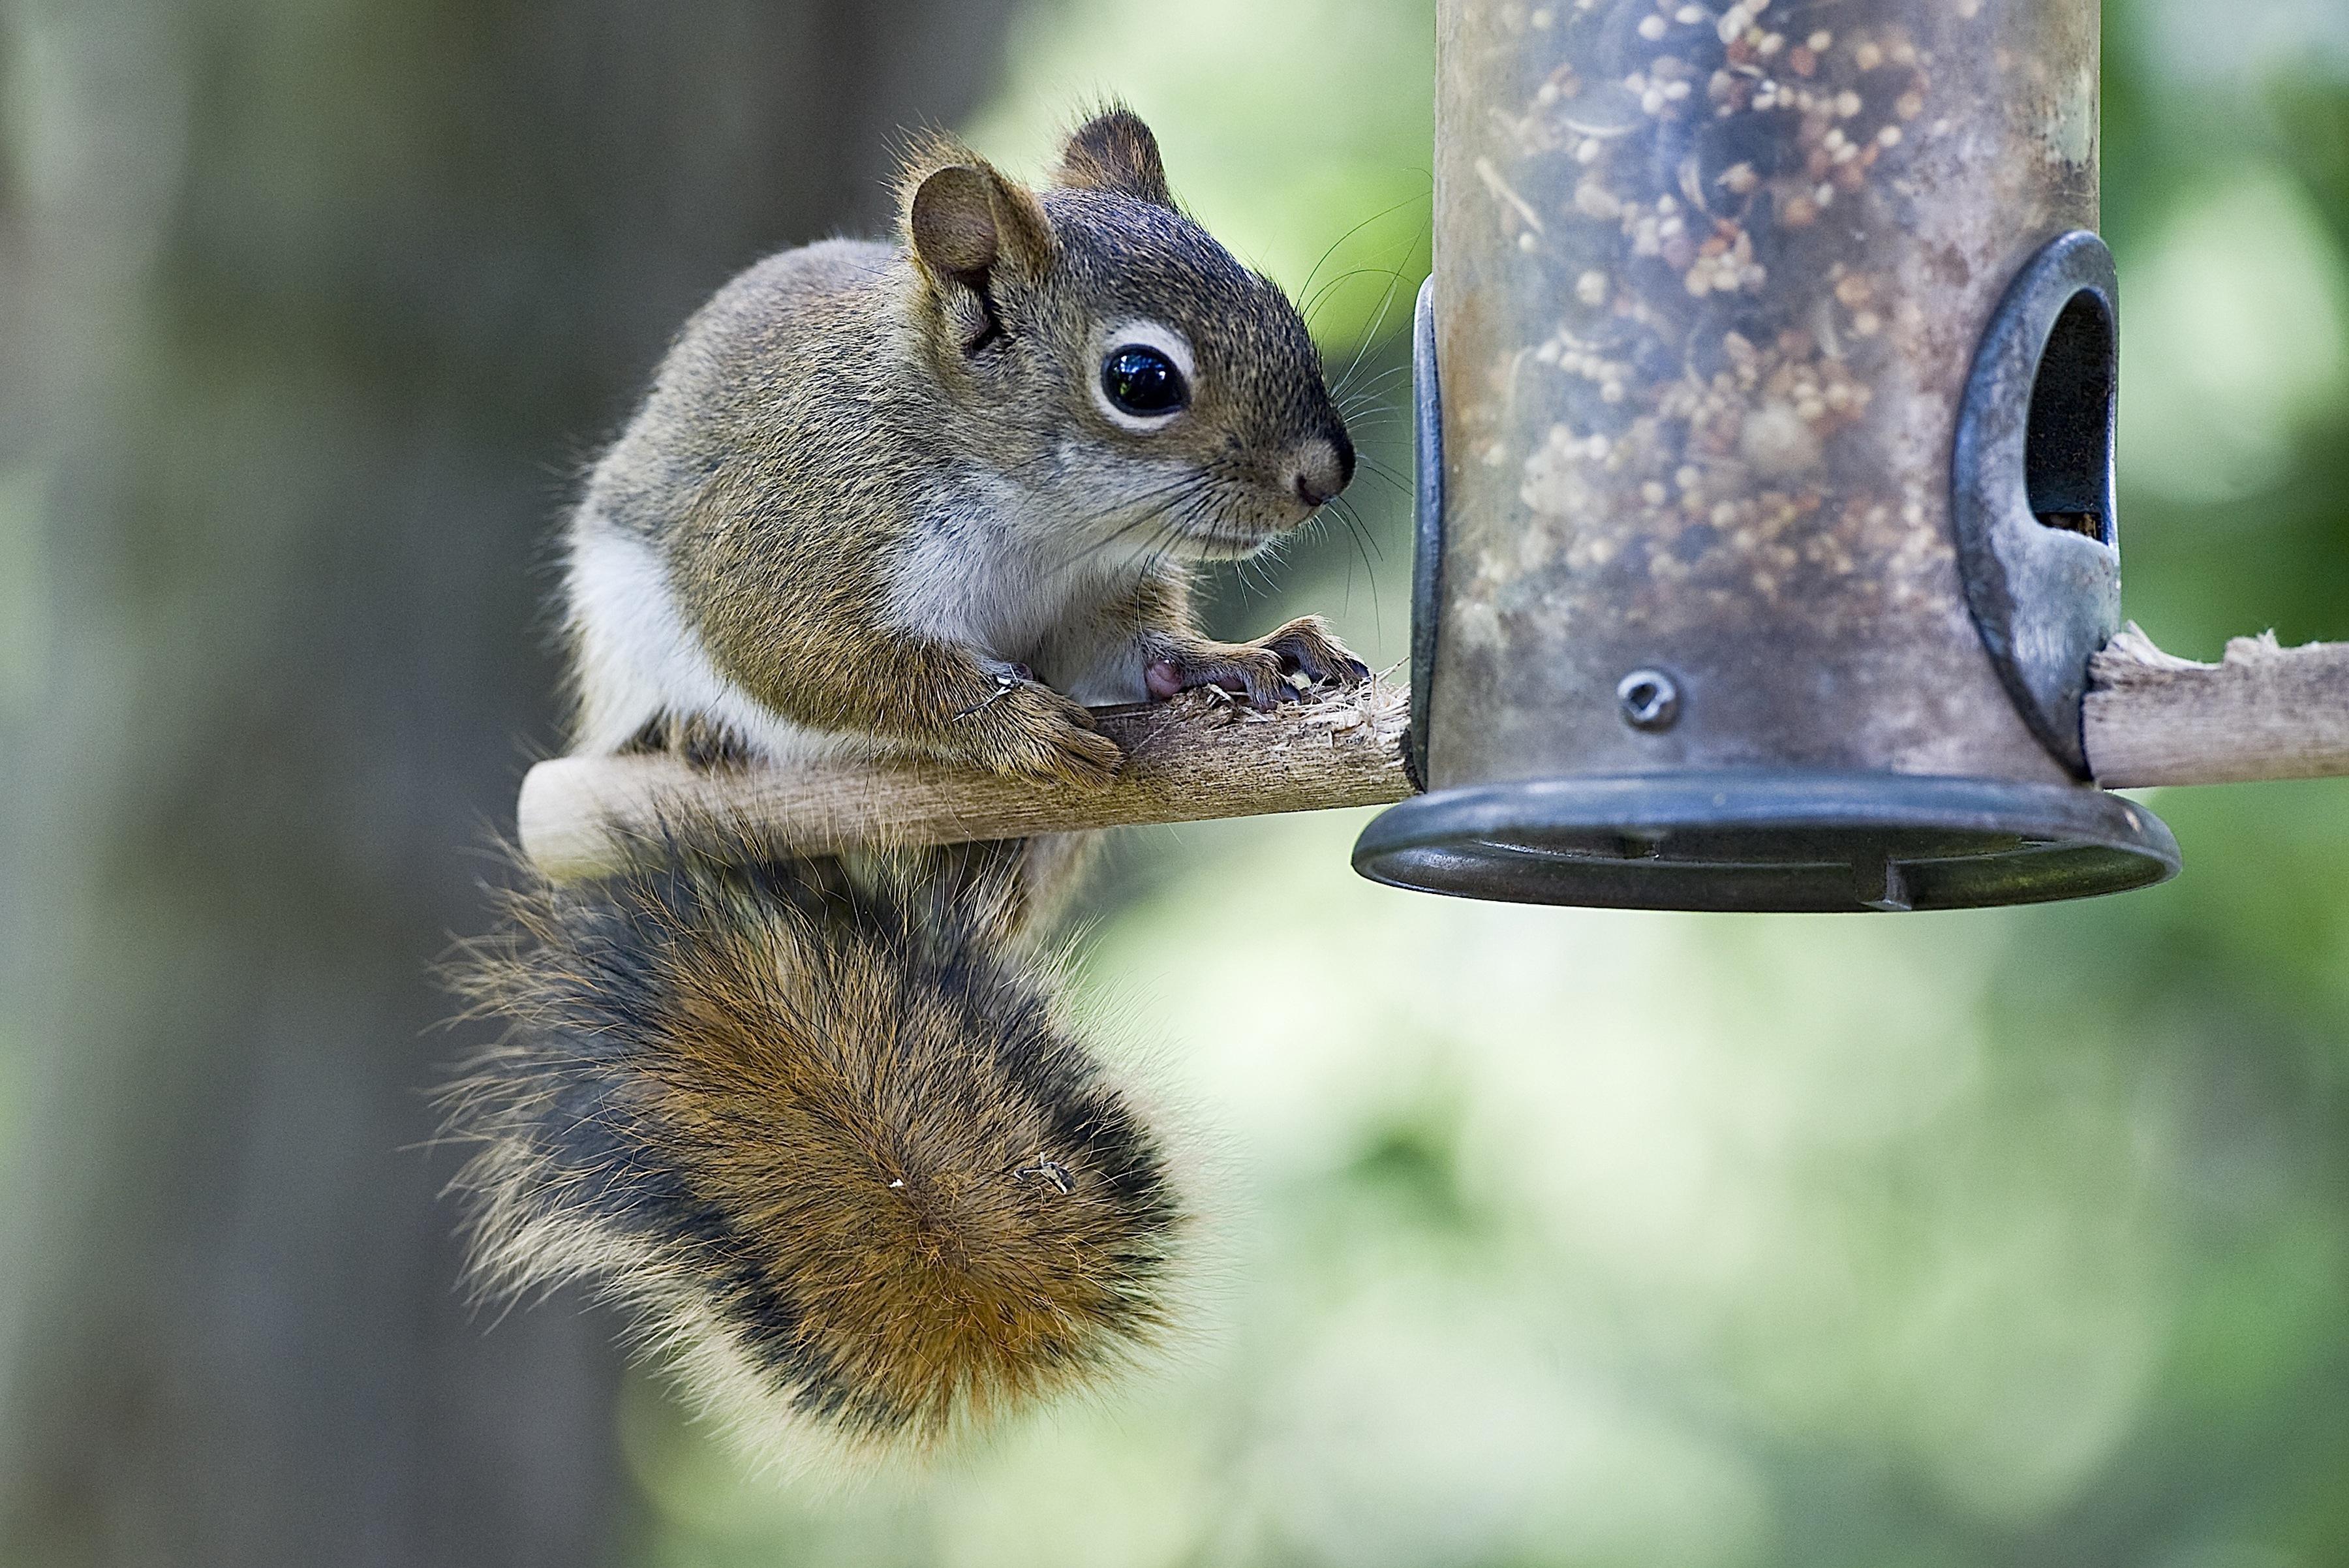 Squirrel at a bird feeder